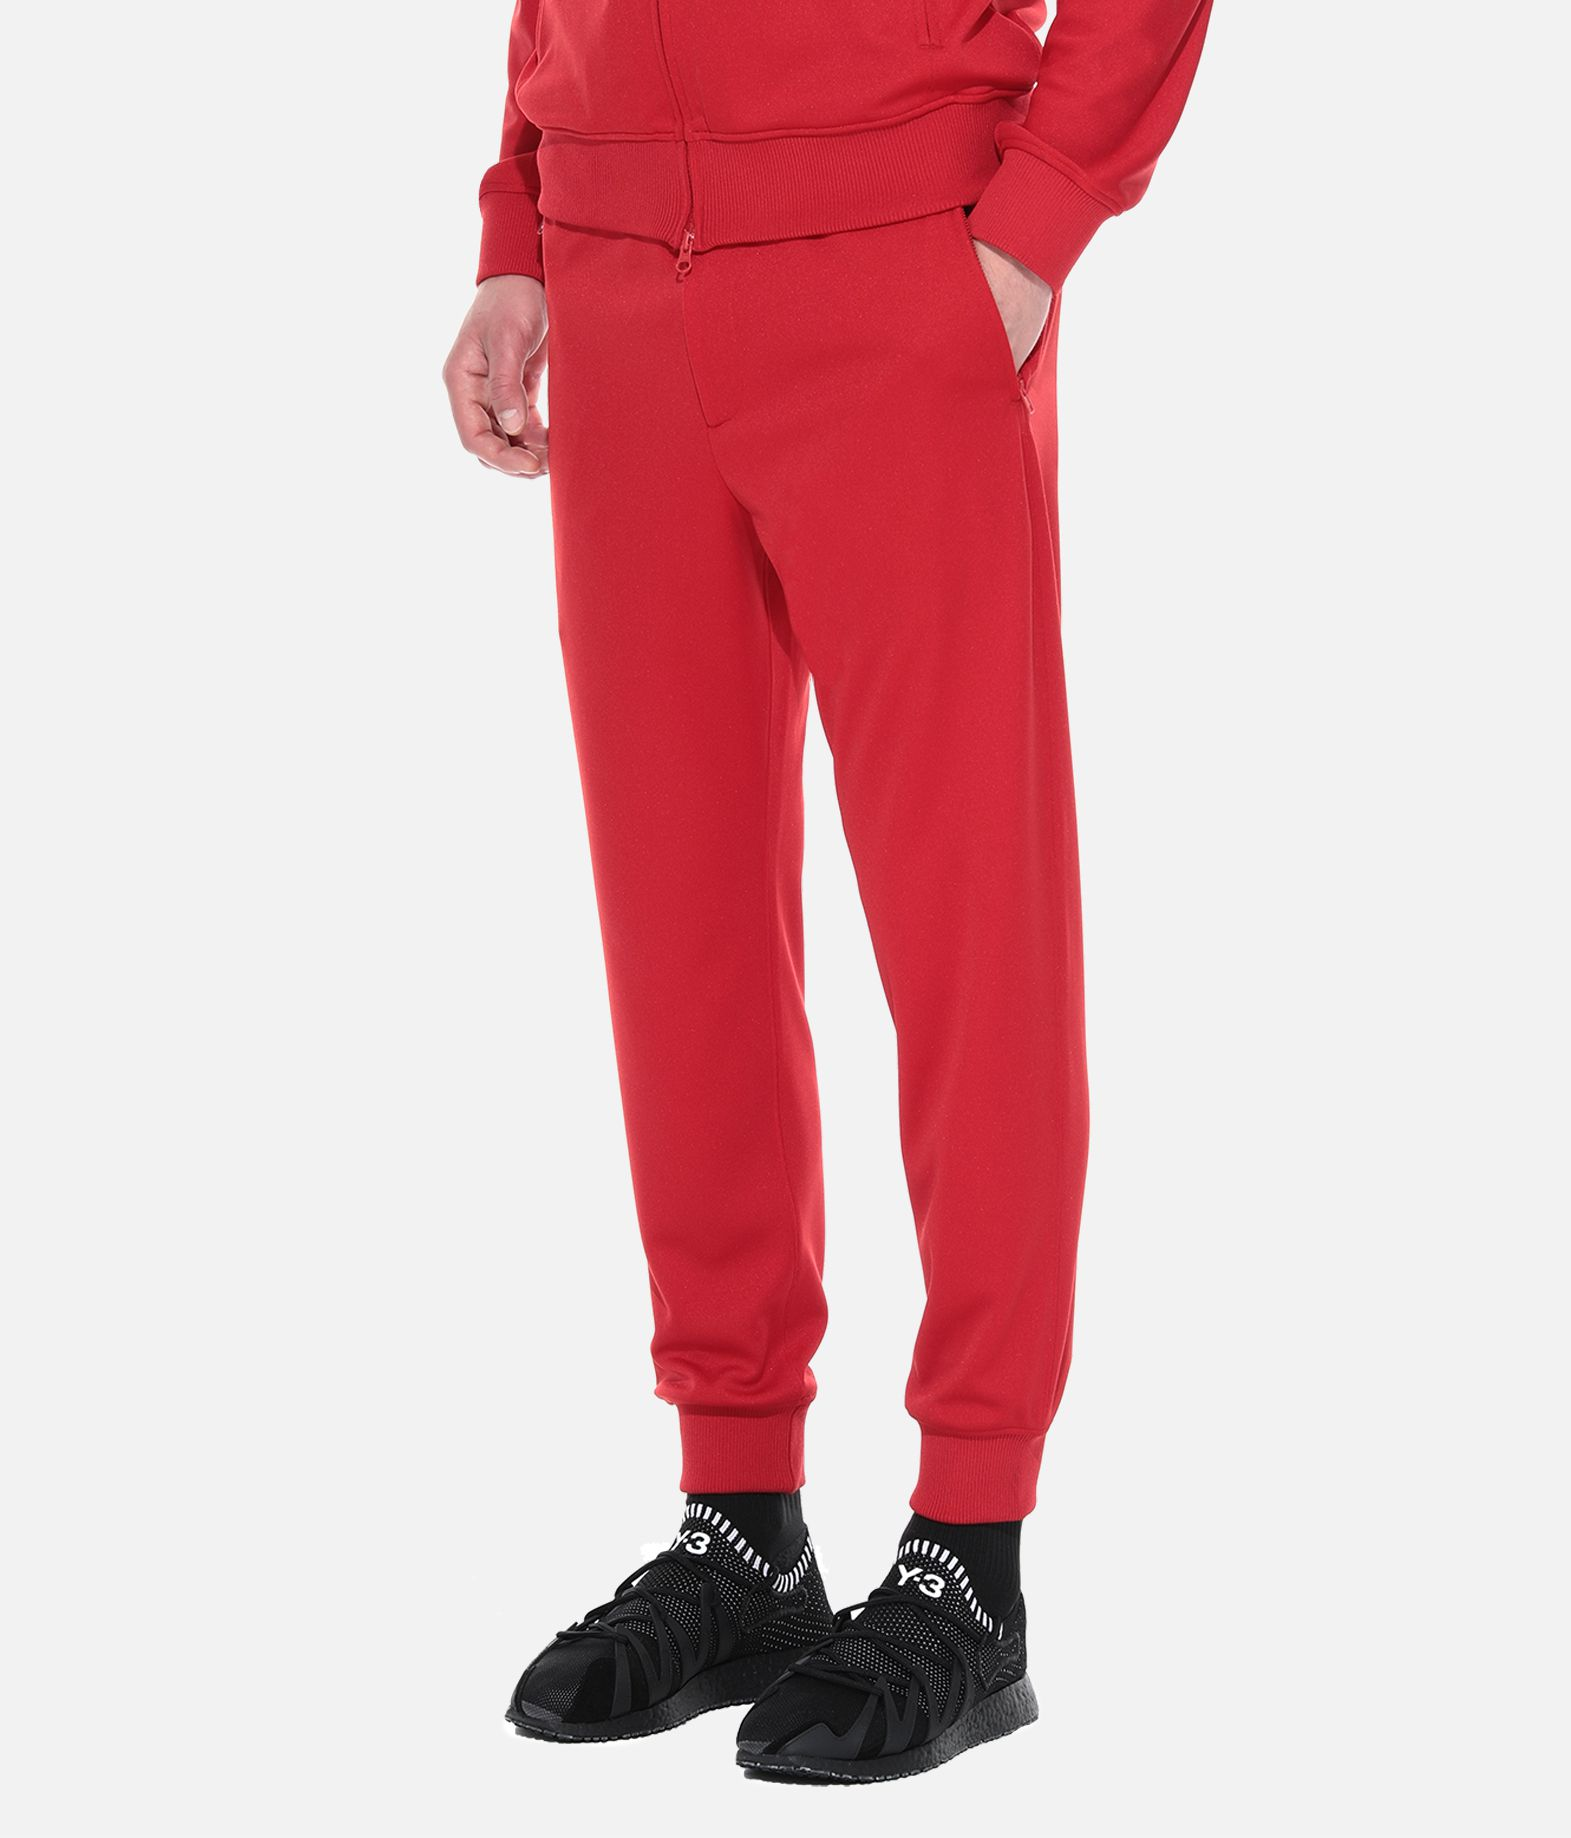 Y-3 Y-3 Classic Track Pants Тренировочные брюки Для Мужчин e